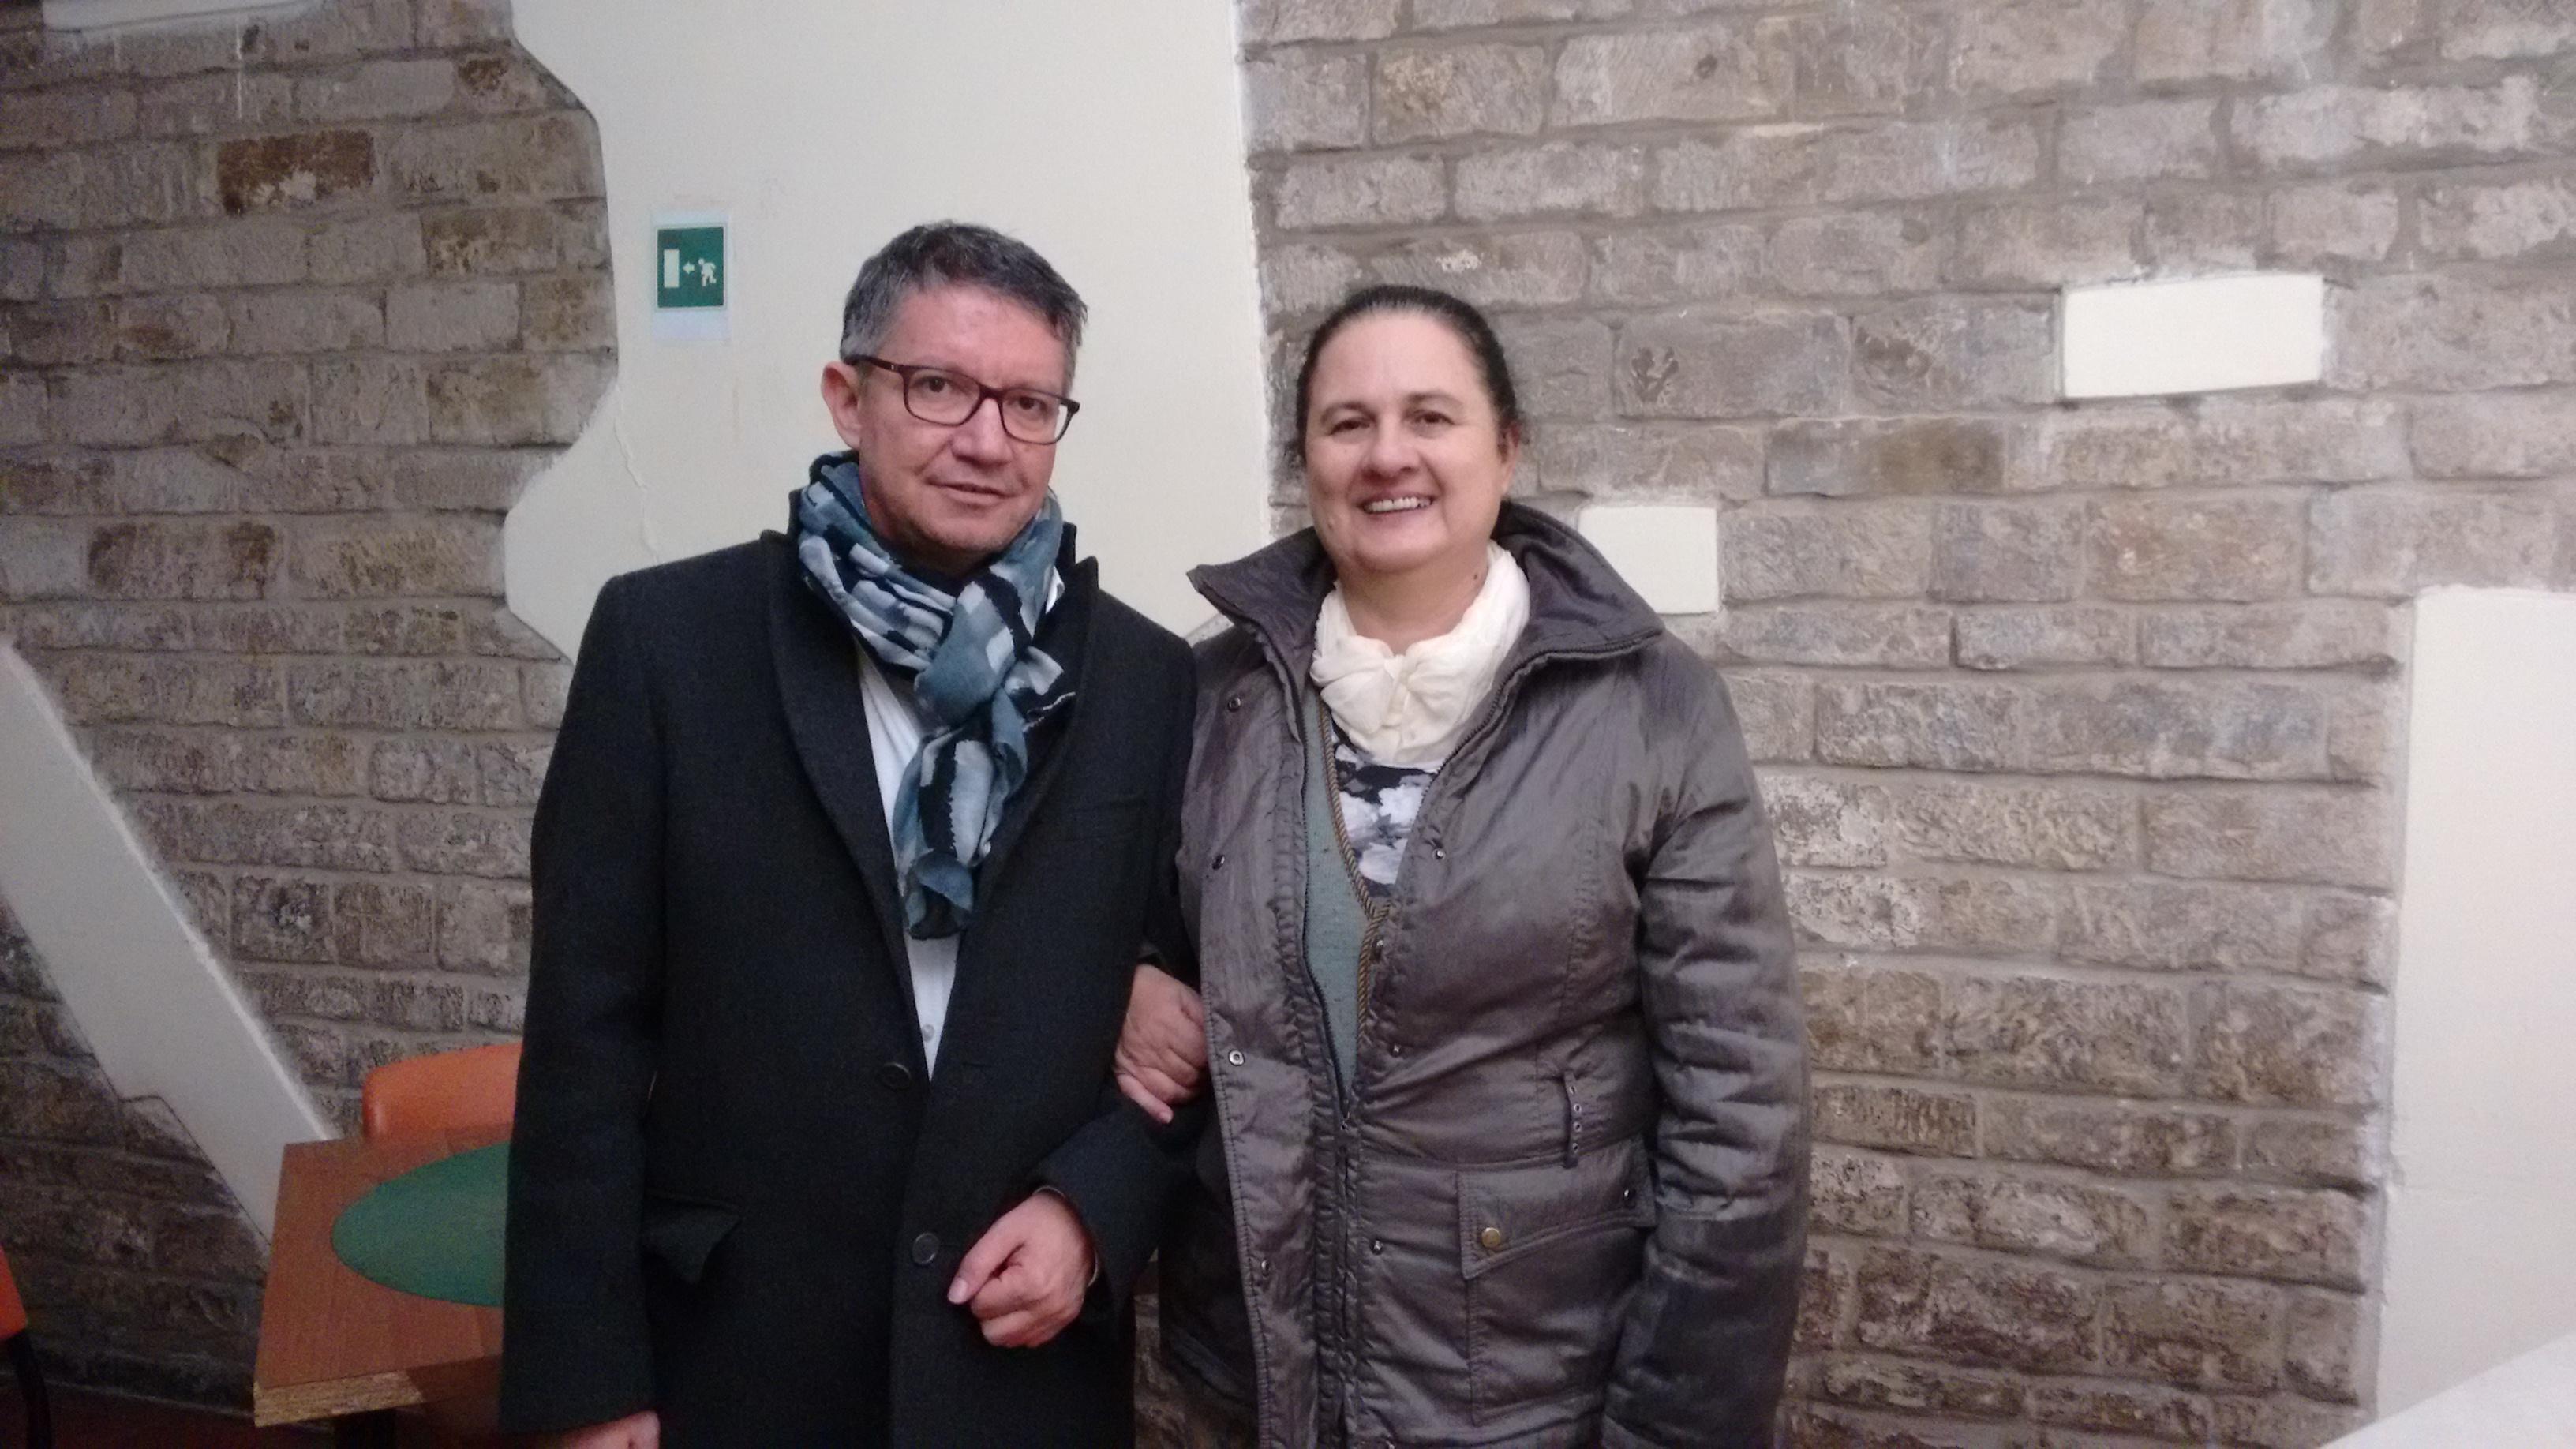 Nicola Tufaro Presidente Circolo di Sant'Angelo a Legnaia e Rita Di Goro, Presidente A.Ge.